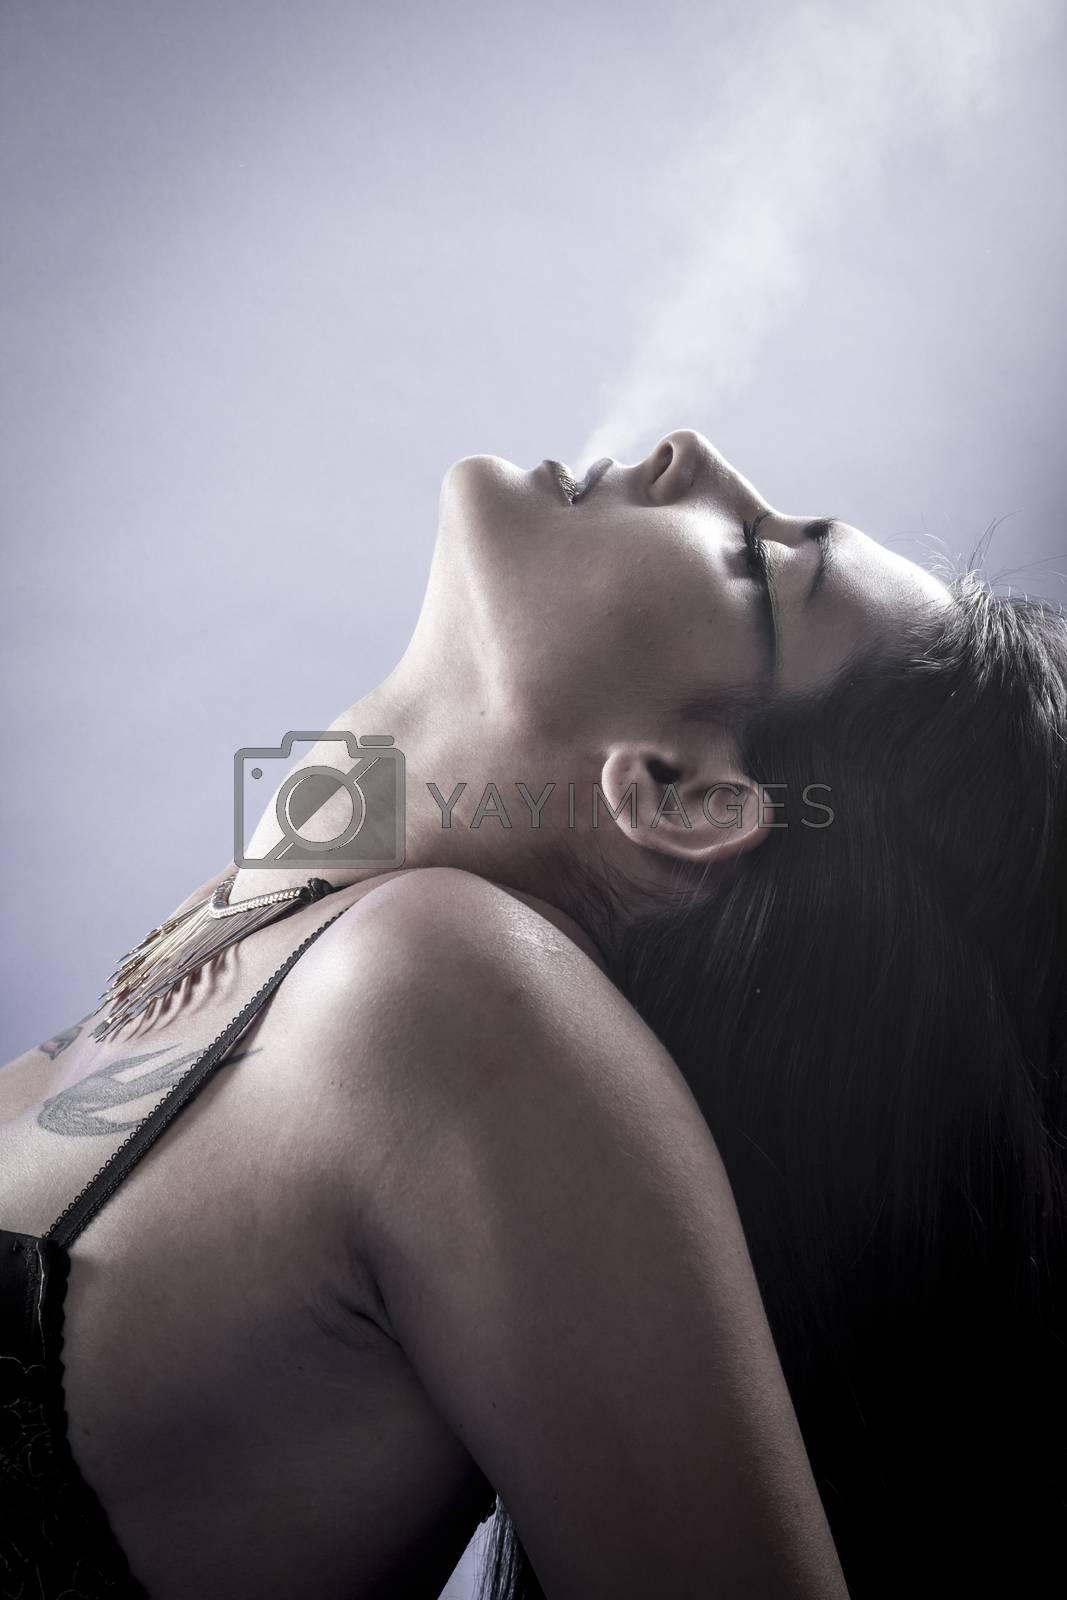 Royalty free image of glamour, Sensual brunette dressed in black lingerie by FernandoCortes